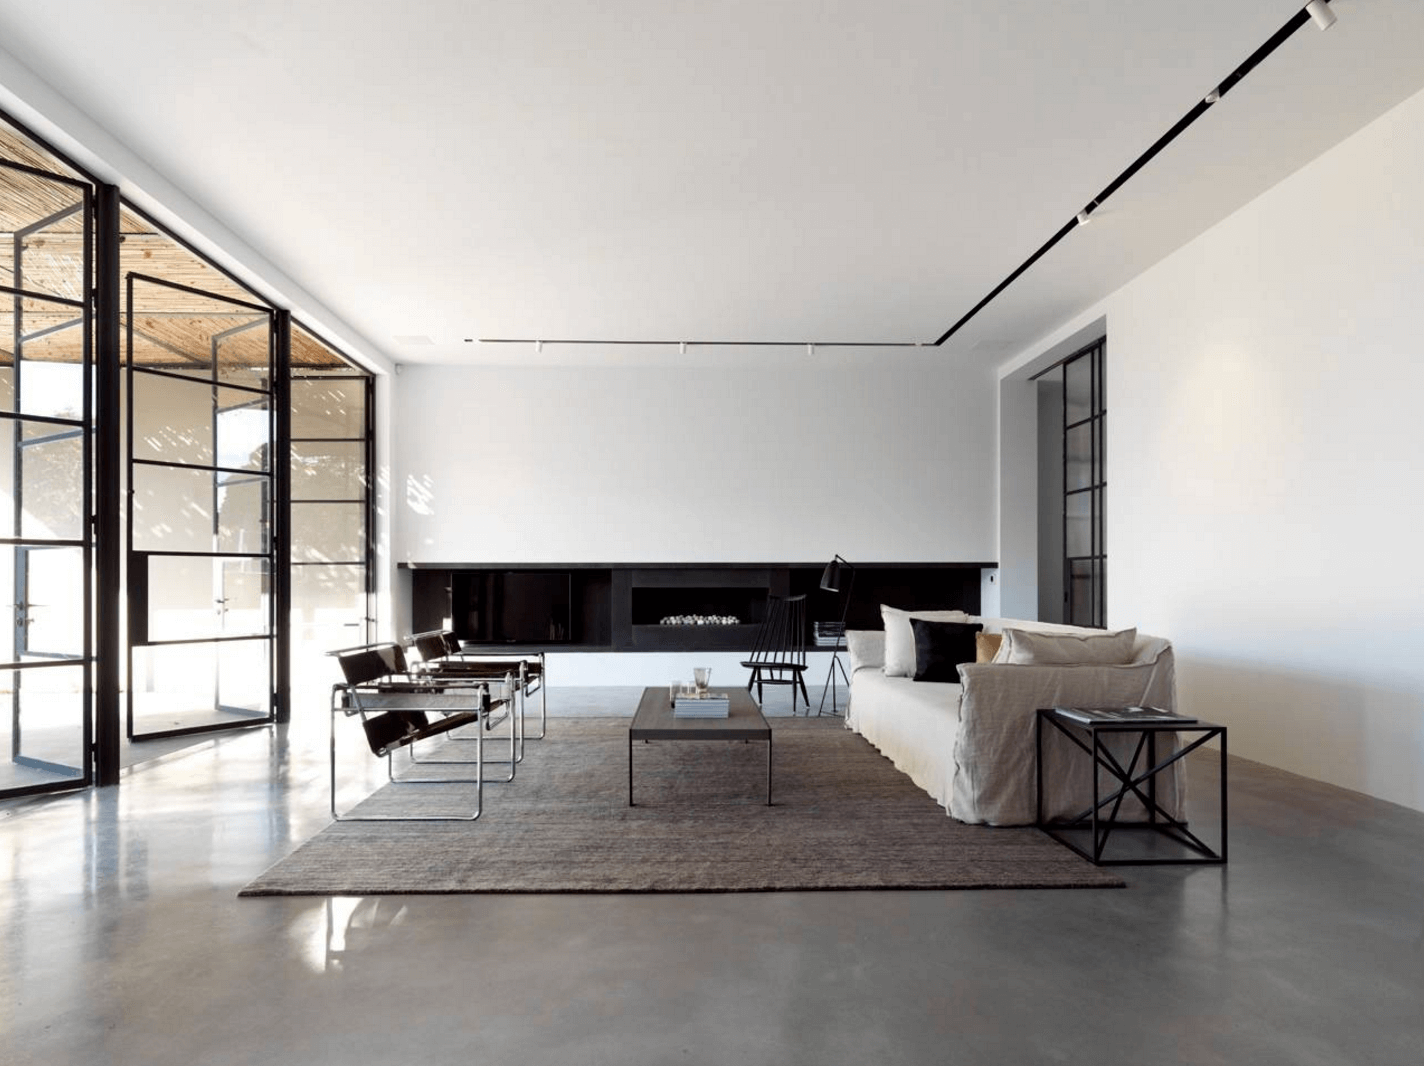 5 Modern Minimalist Interior Design Ideas For Your Loft Conversion